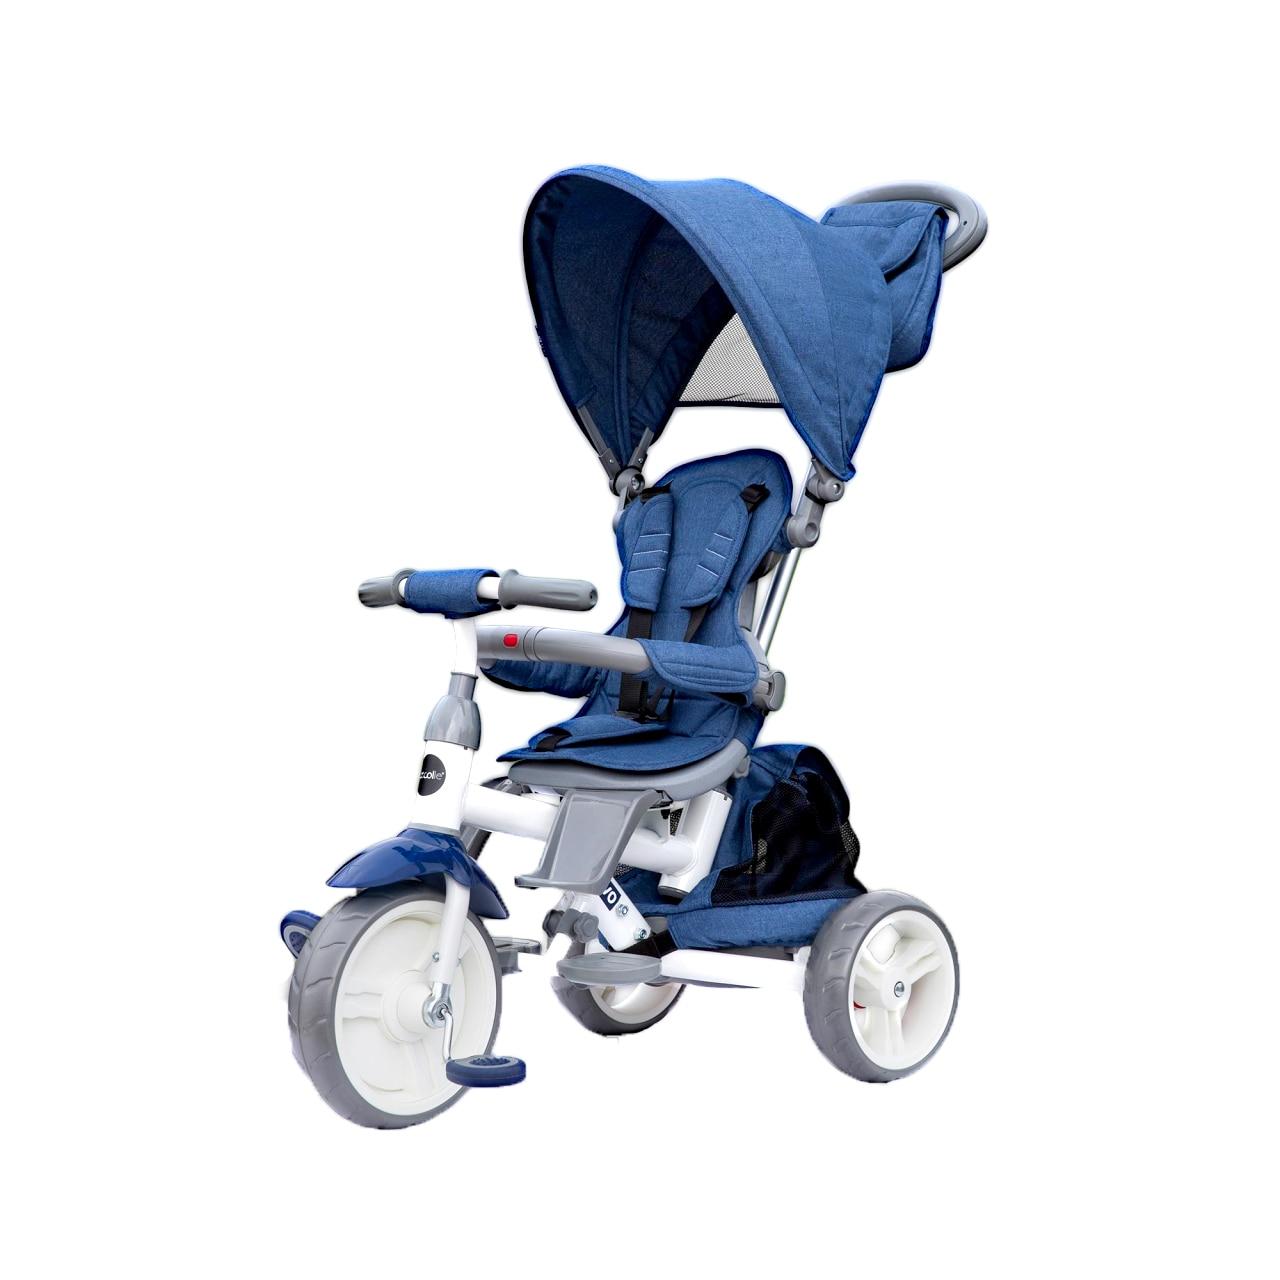 Fotografie Tricicleta cu sezut reversibil Coccolle Evo, Albastru